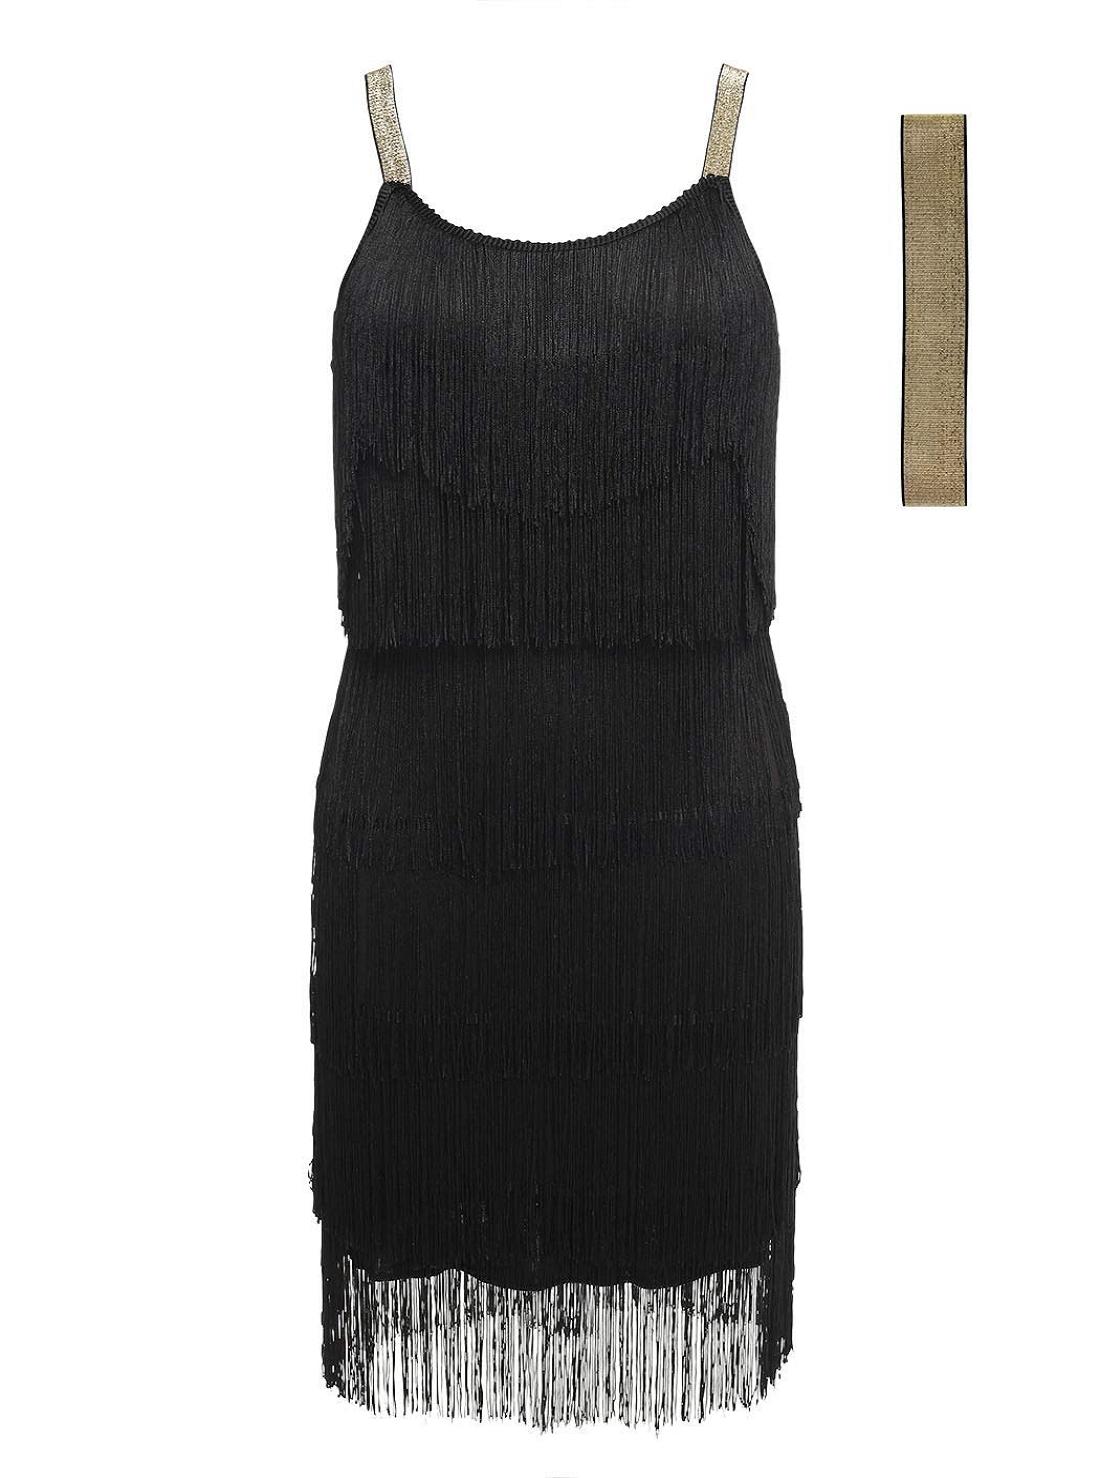 Wholesale Fringe Flapper Dress